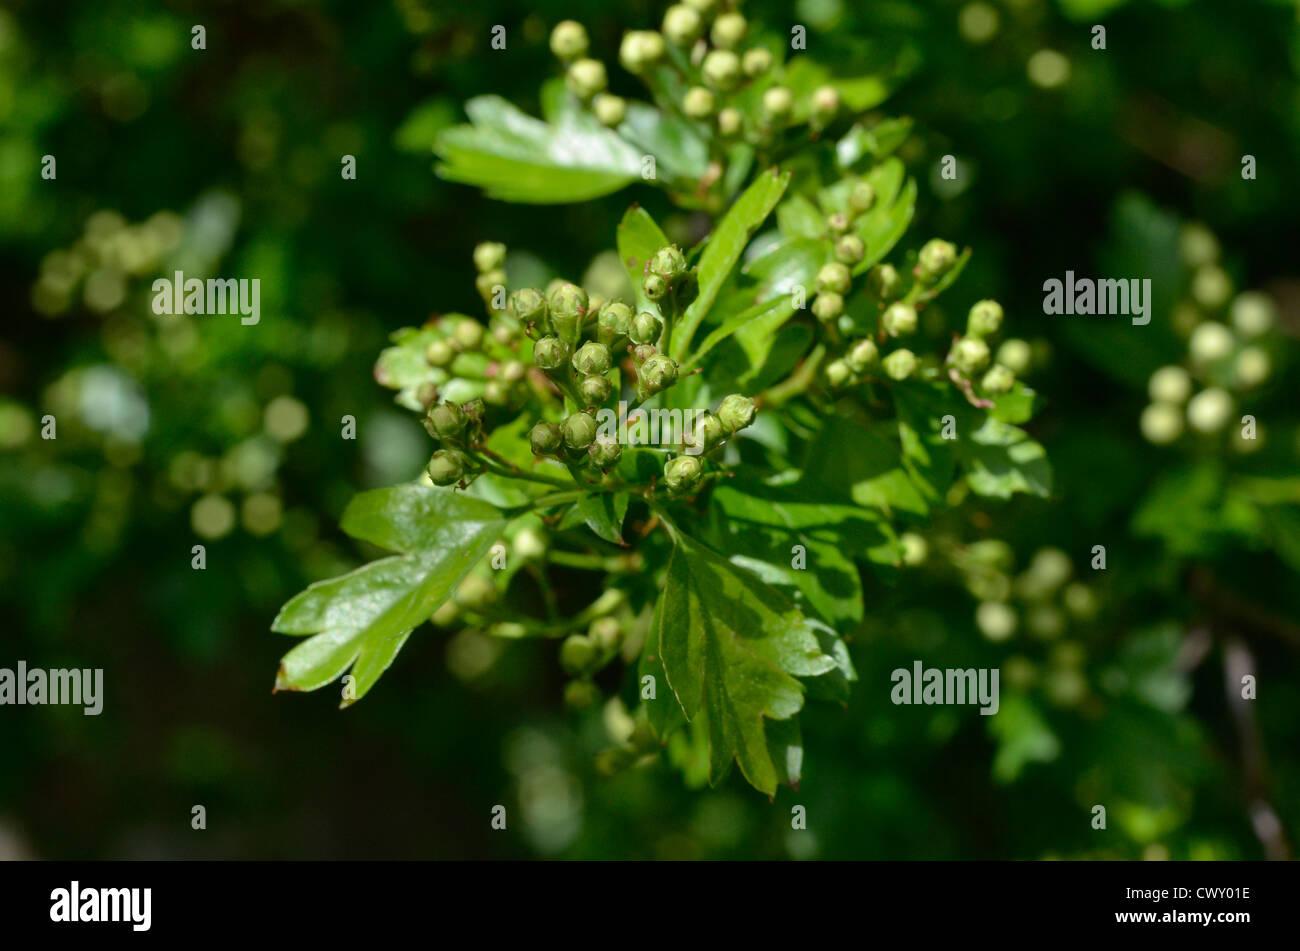 Flower buds of Hawthorn tree / Crataegus monogyna. - Stock Image